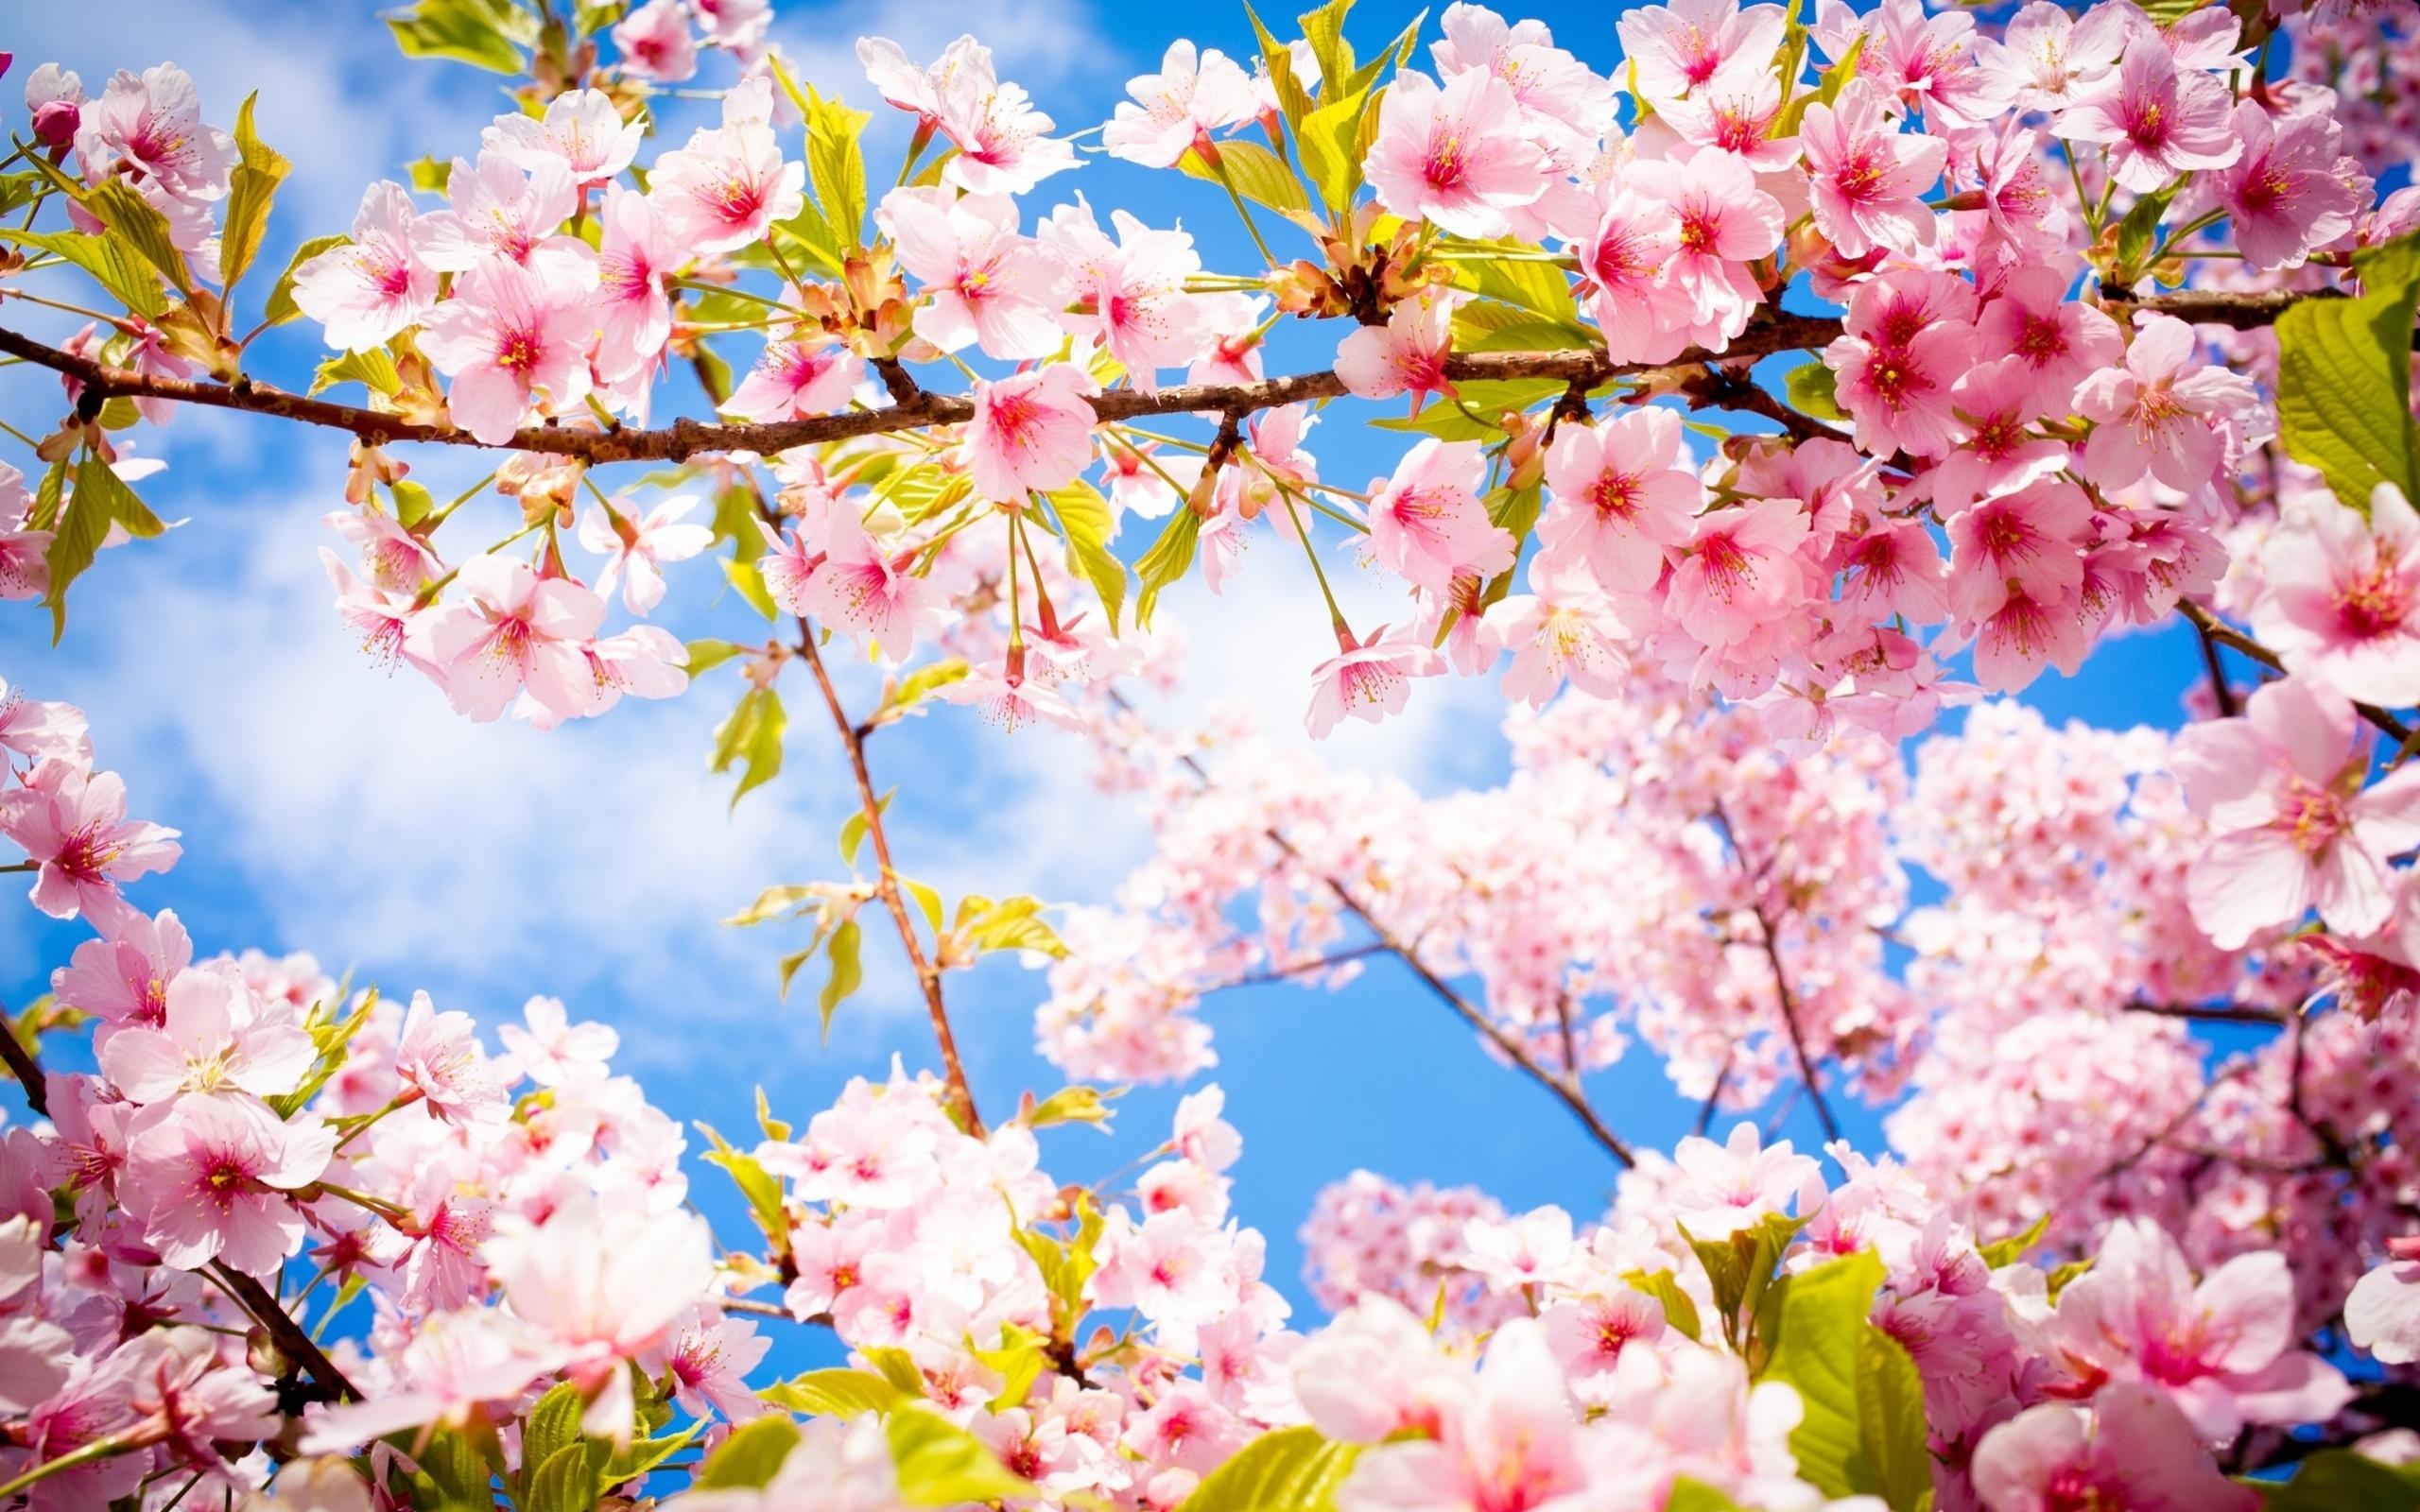 Beautiful spring flowering forest wallpapers and images wallpapers beautiful spring flowering forest wallpapers and images wallpapers pictures photos izmirmasajfo